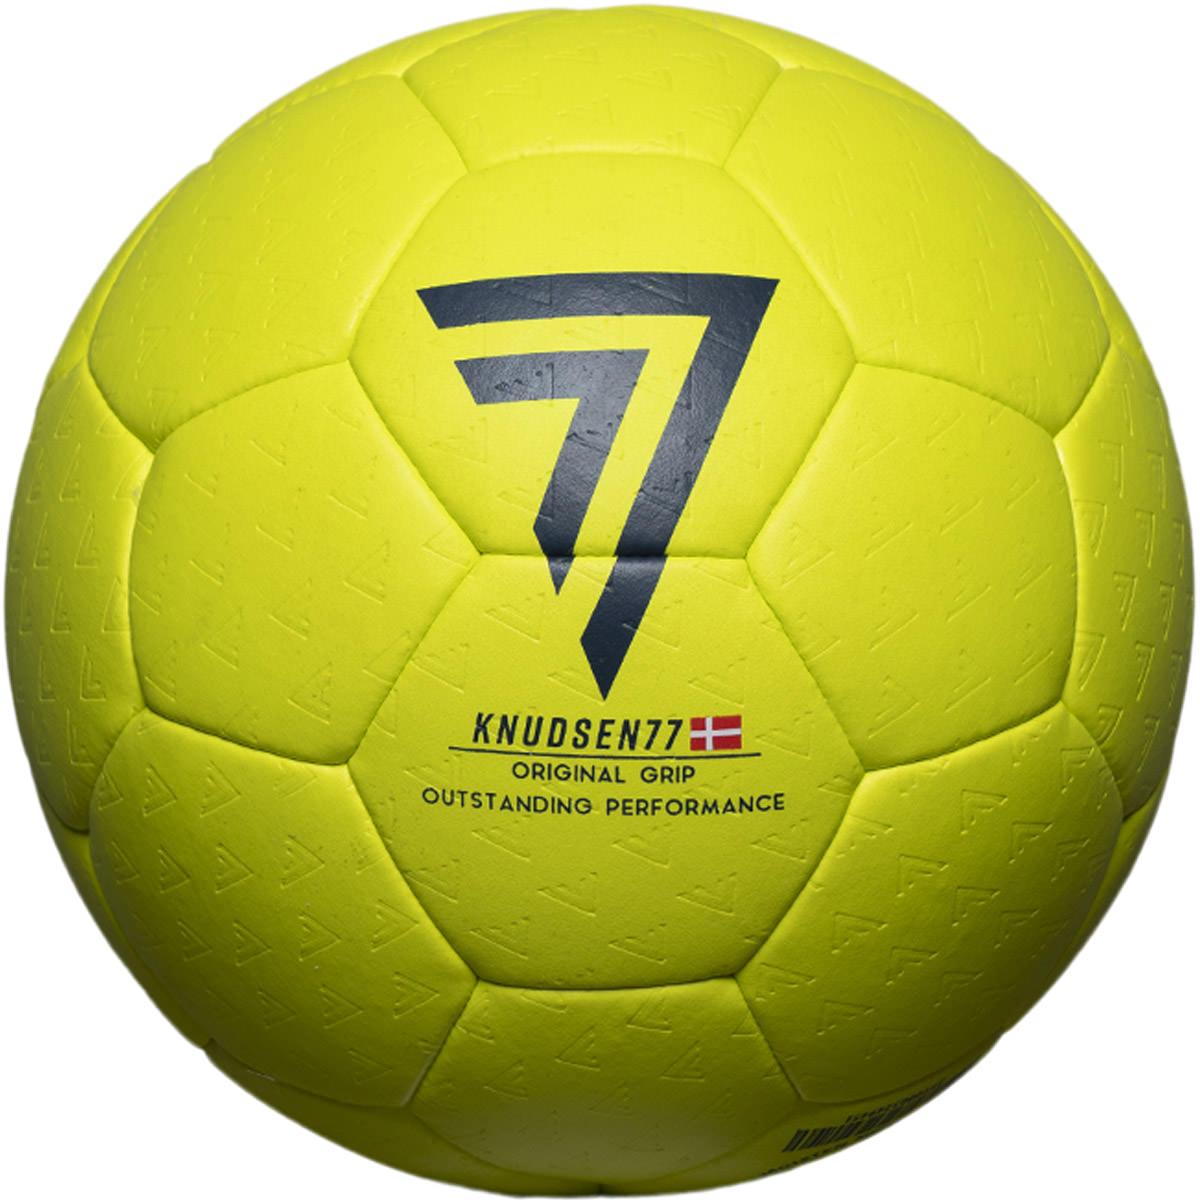 KNUDSEN77 Håndbold